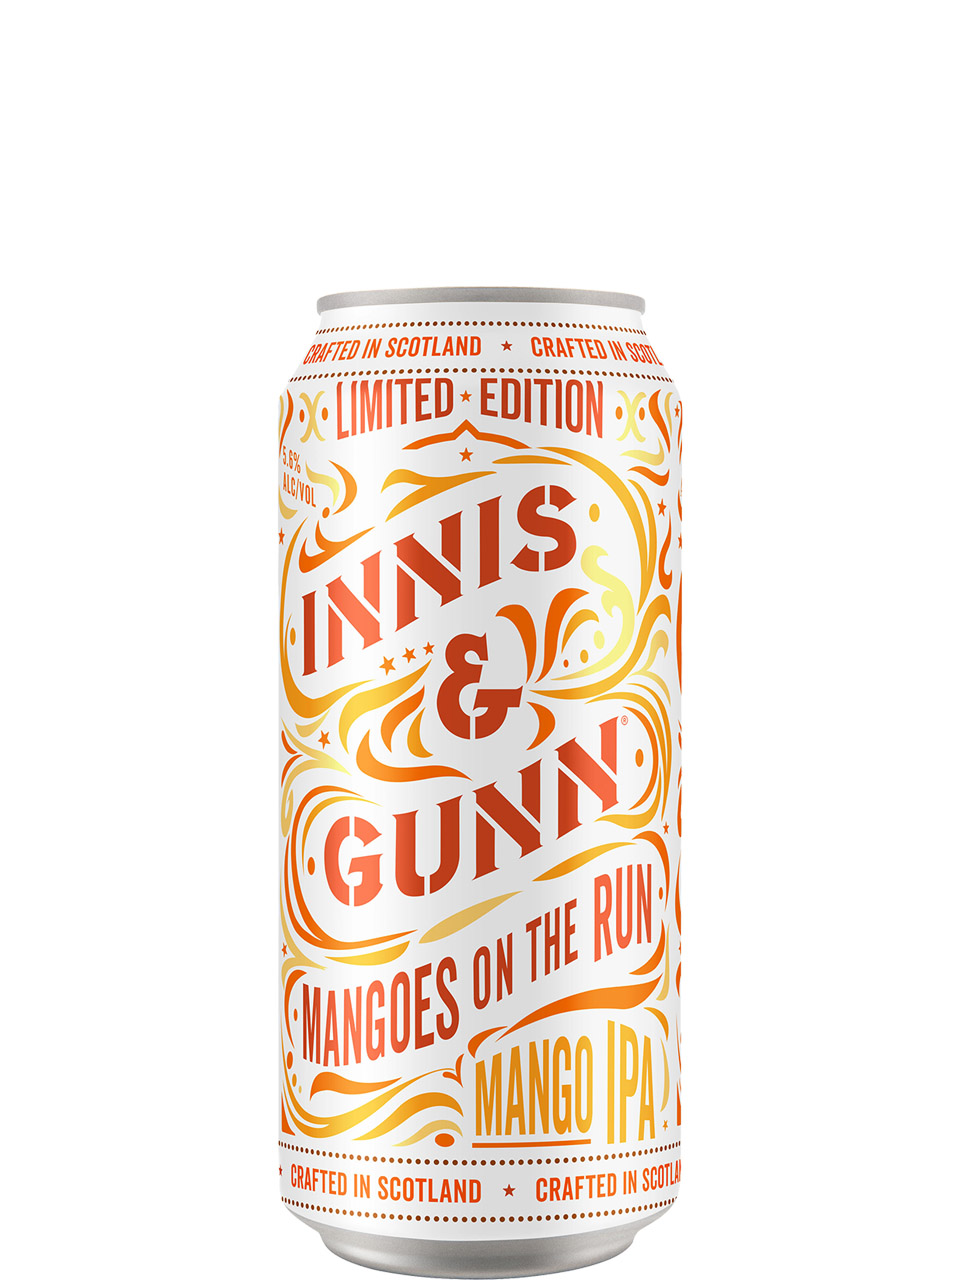 Innis & Gunn Mangoes On The Run IPA 500ml Can